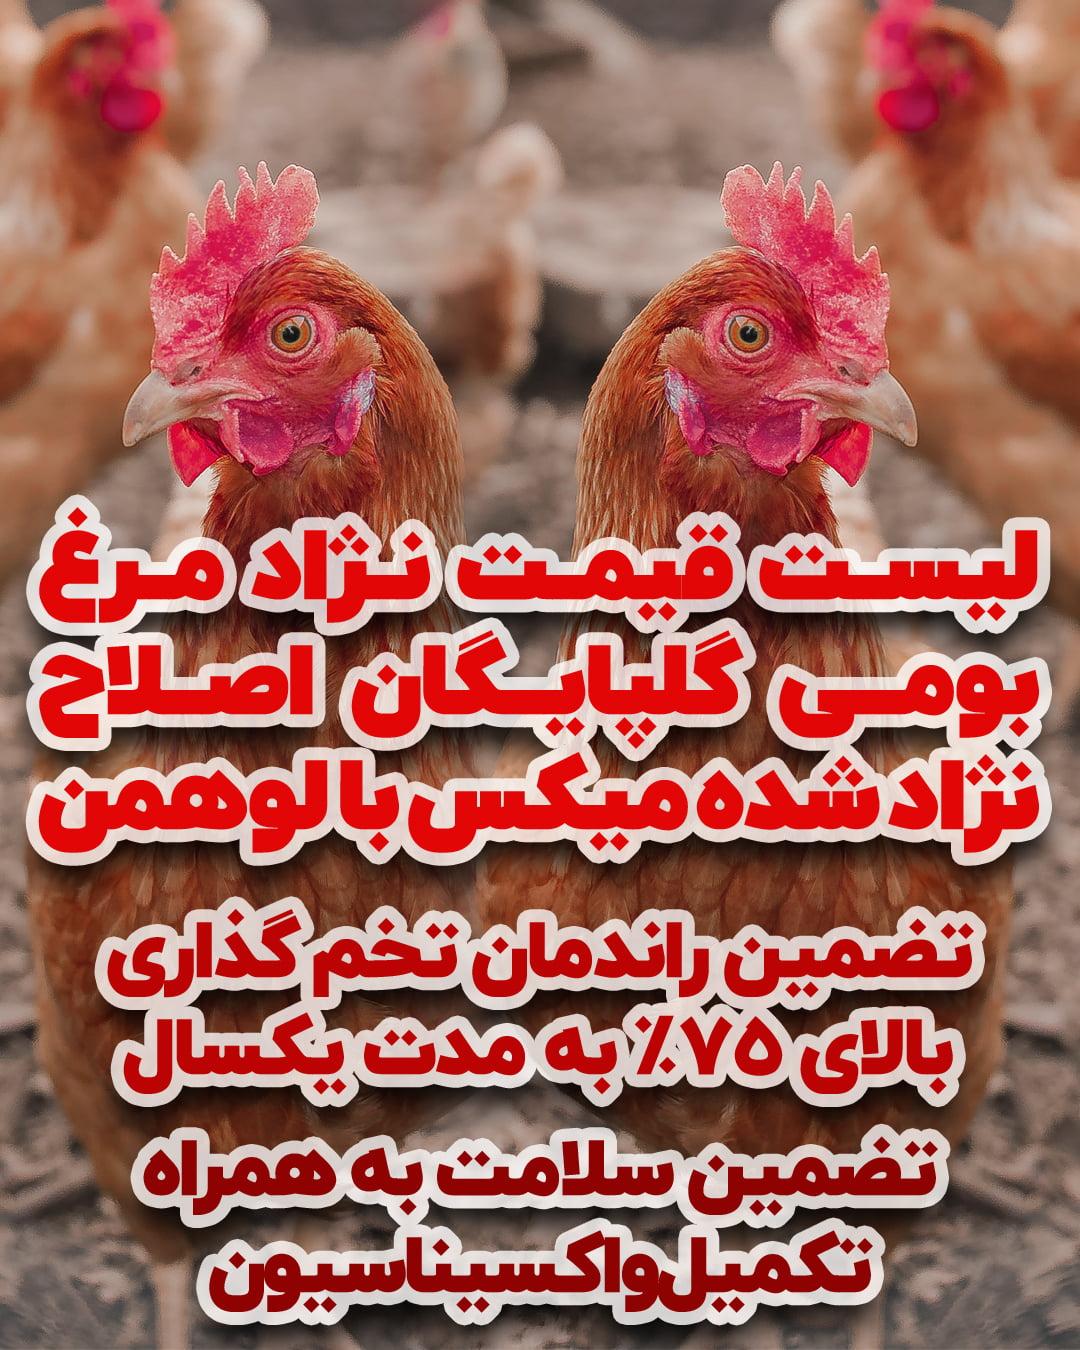 مرغ گلپایگانی اصلاح نژاد